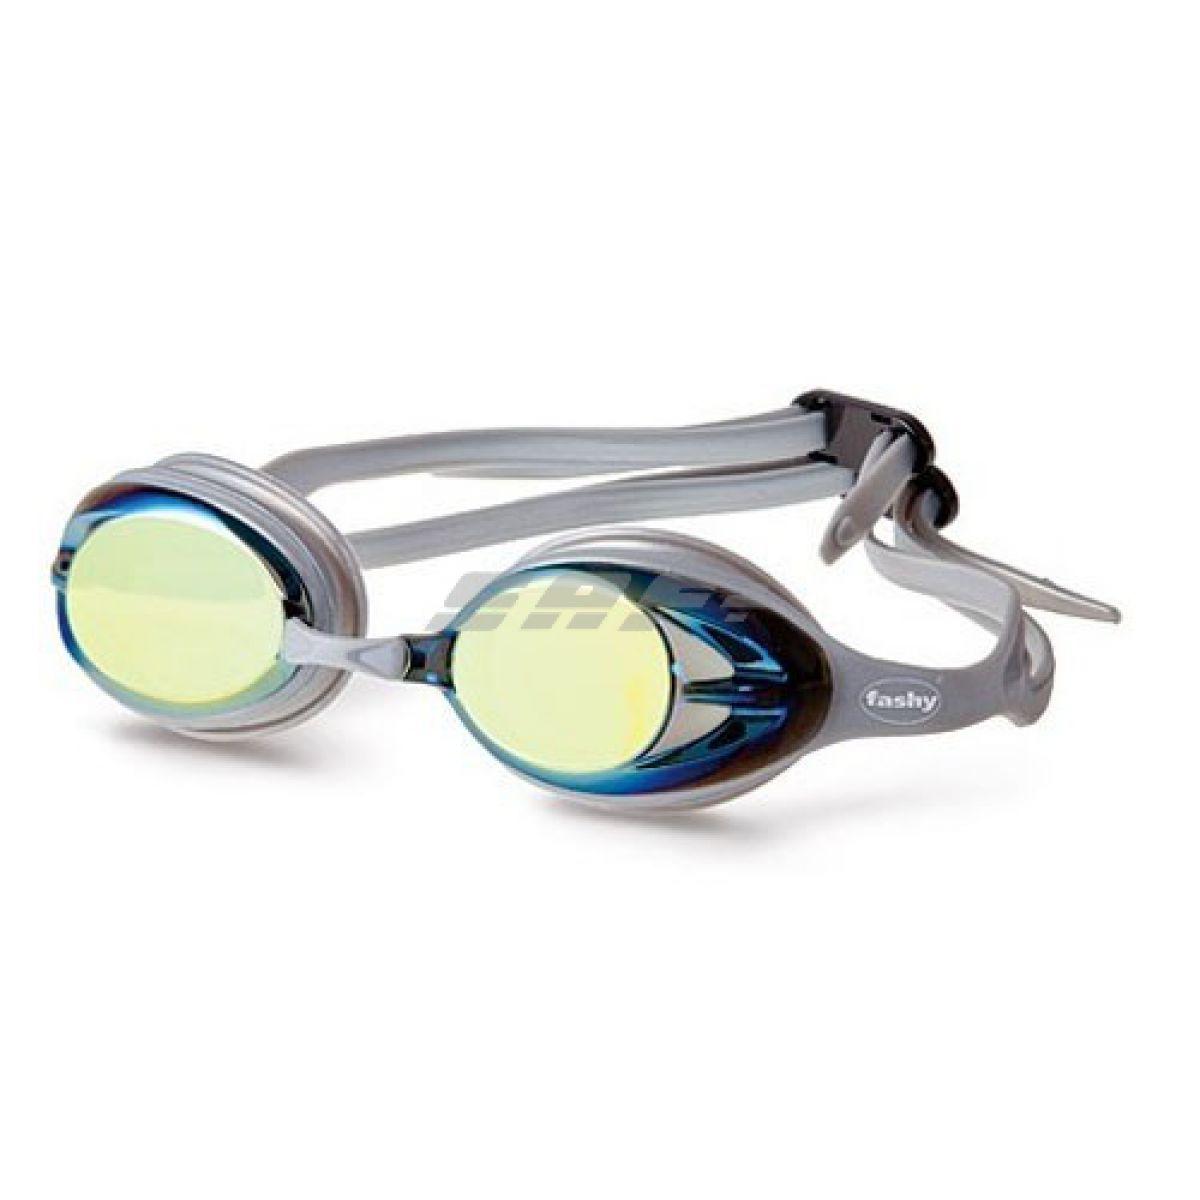 Очки для плавания FASHY Power Mirror Pioneer